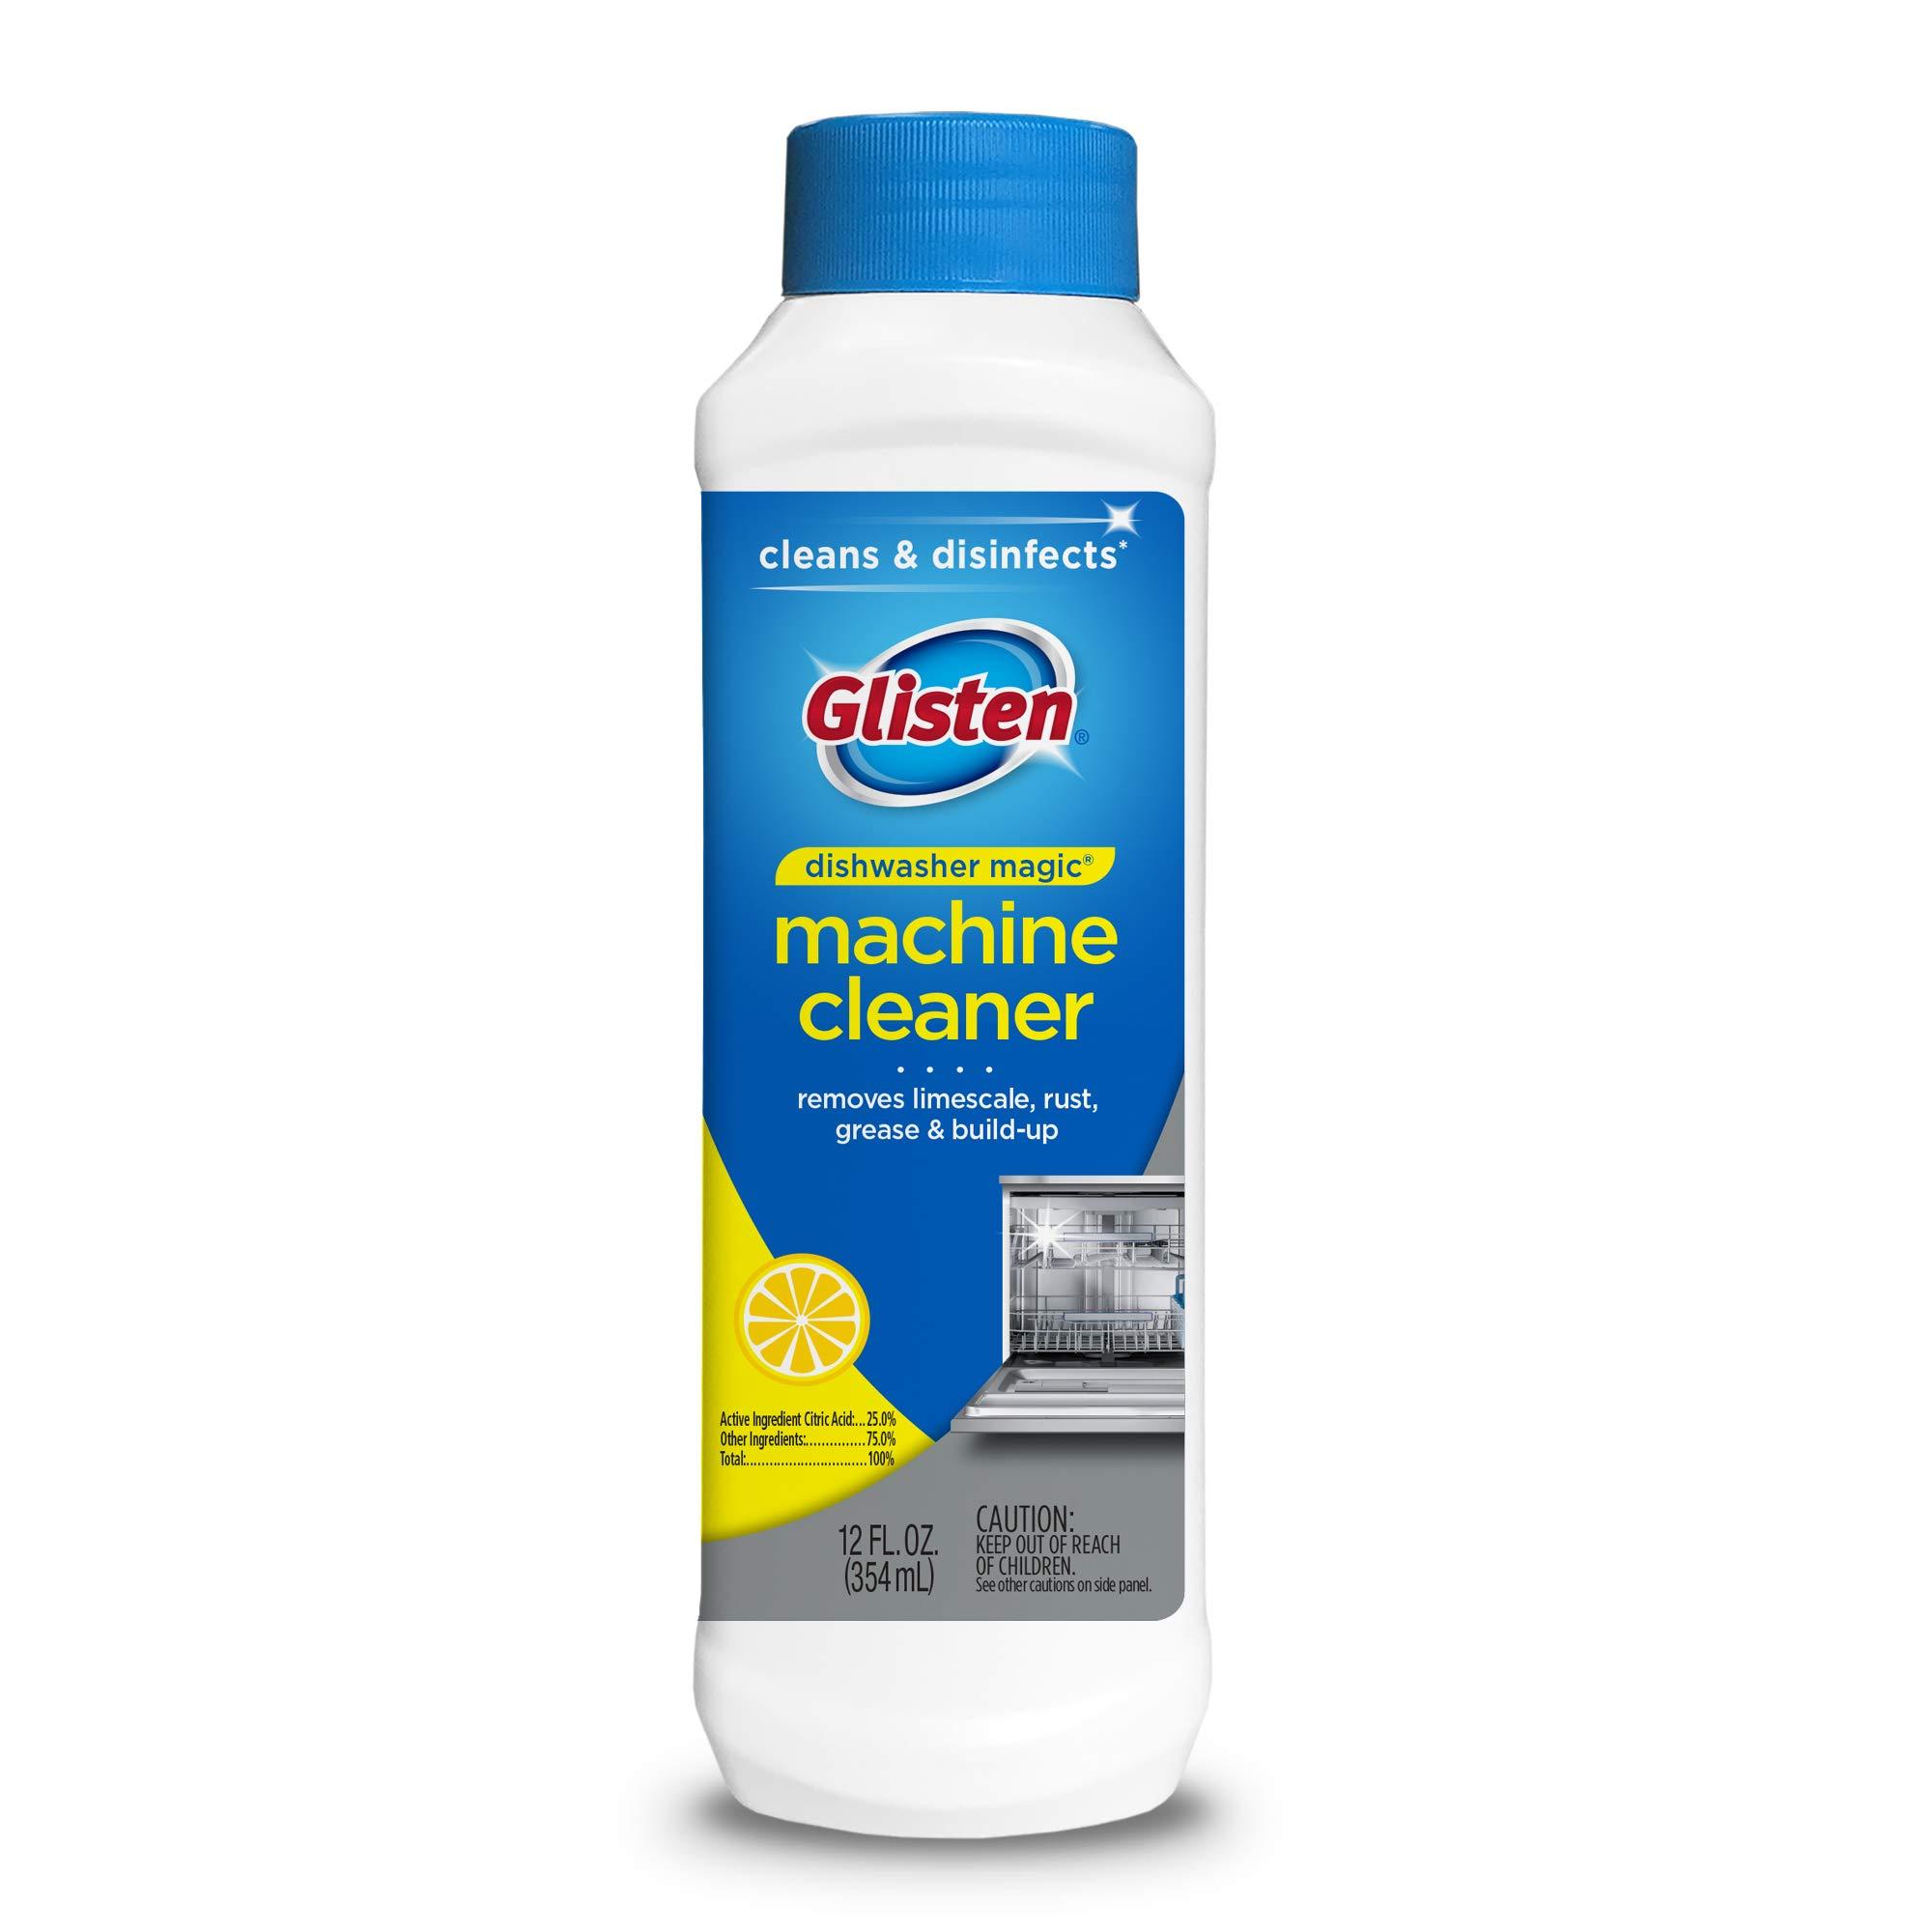 Glisten Dishwasher Magic Cleaner and Disinfectant, 12 Fl. Oz. Bottle, 6 Pack